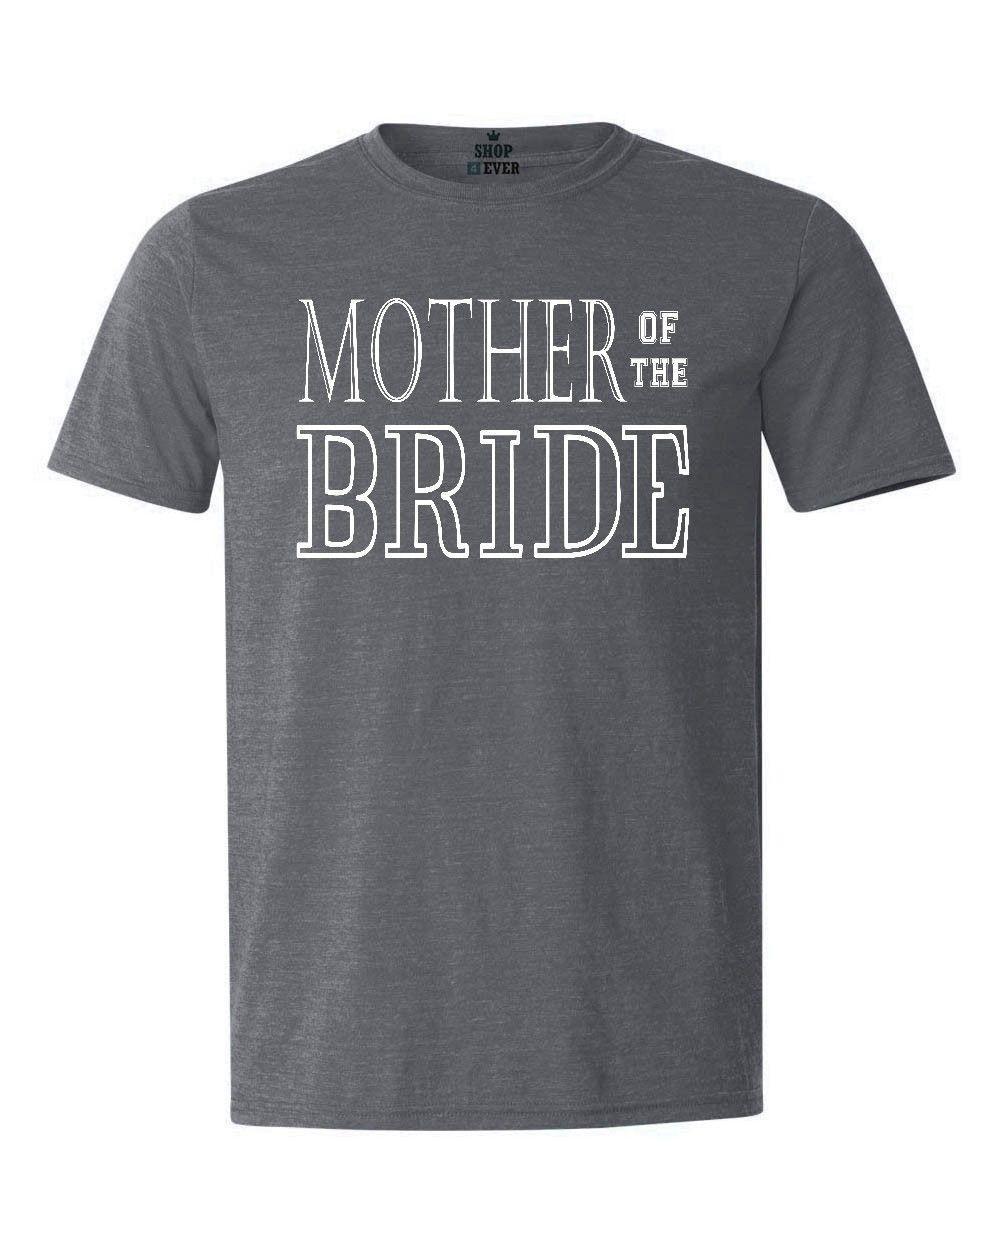 39f2c4165 Mother Of The Bride T Shirt Marriage Wedding Bachelorette Party Heather  Shirts Men Women Unisex Fashion Tshirt Tna Shirts Humorous Tee Shirts From  ...